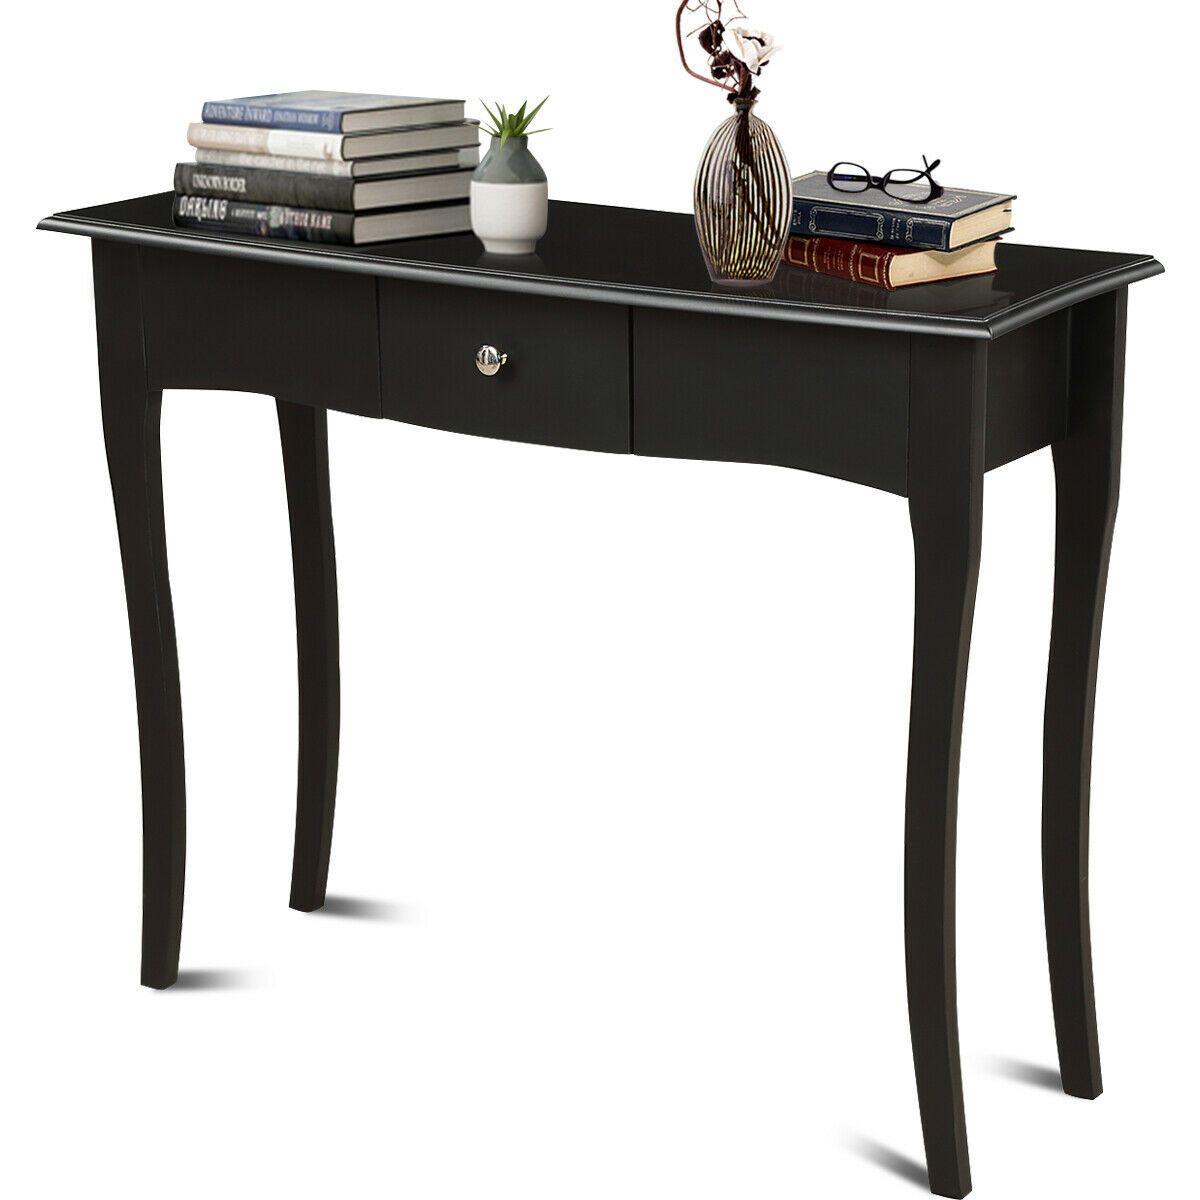 Modern Console Table Entryway Table Sofa Table With Drawer In 2020 Modern Console Tables Sofa Table With Drawers Wooden Console Table